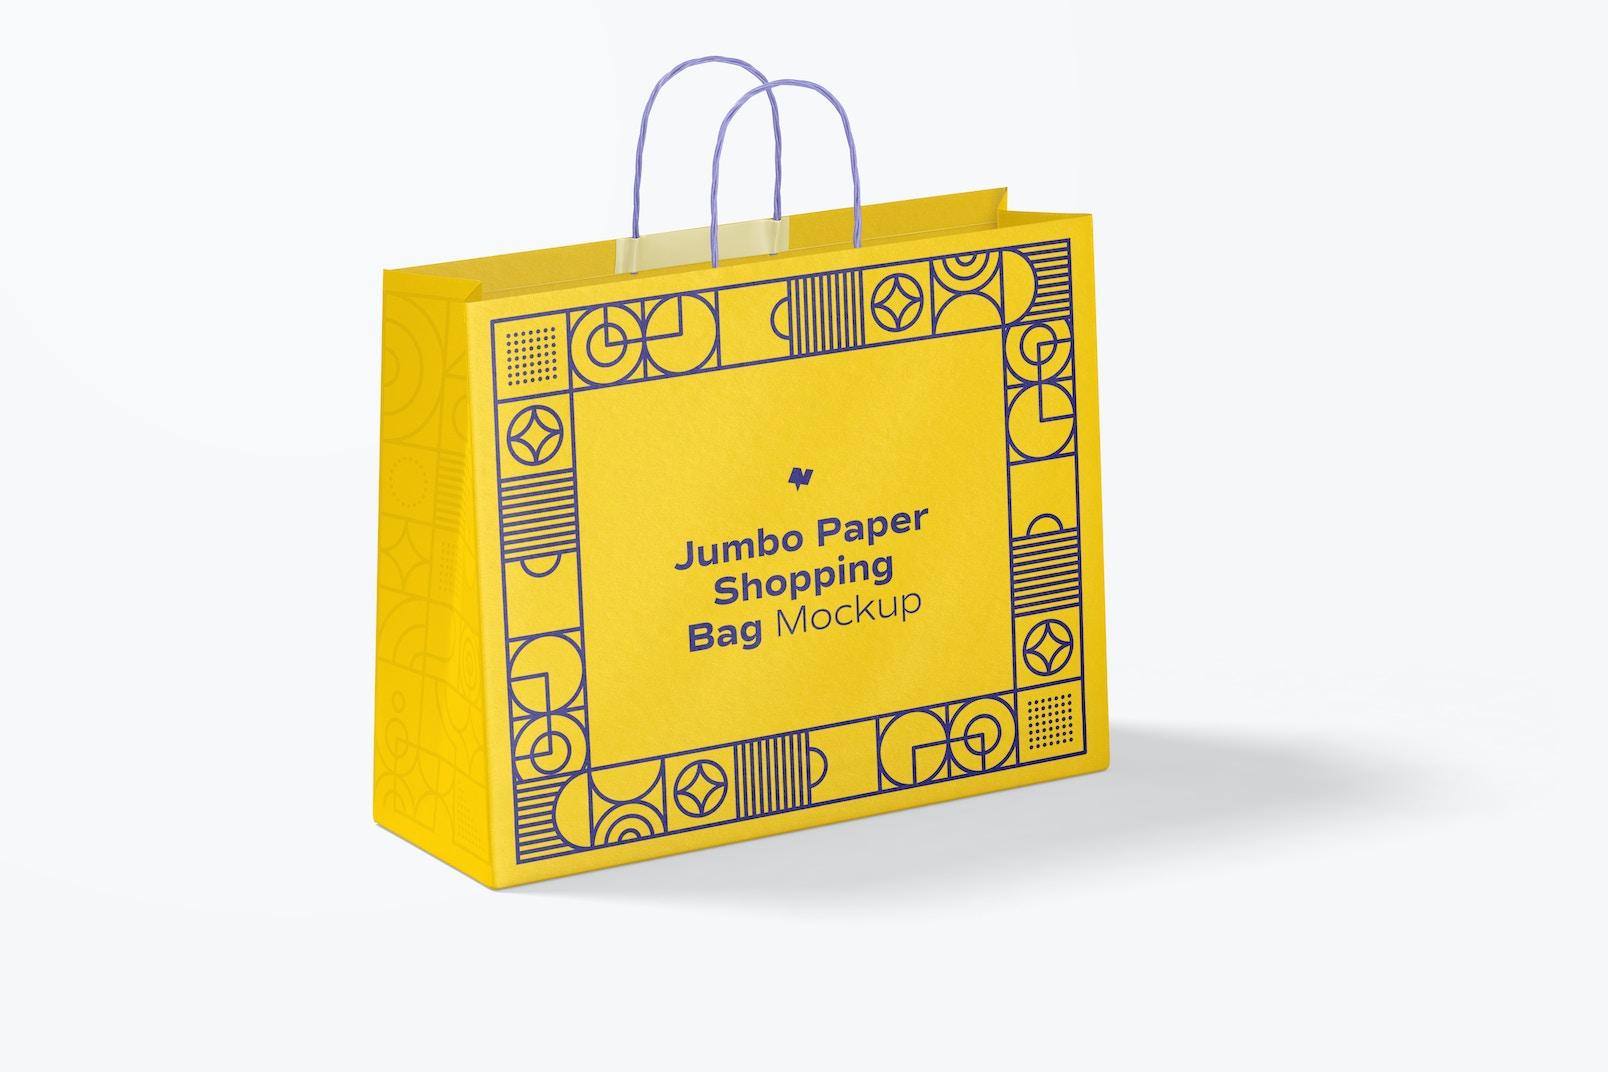 Jumbo Paper Shopping Bag Mockup